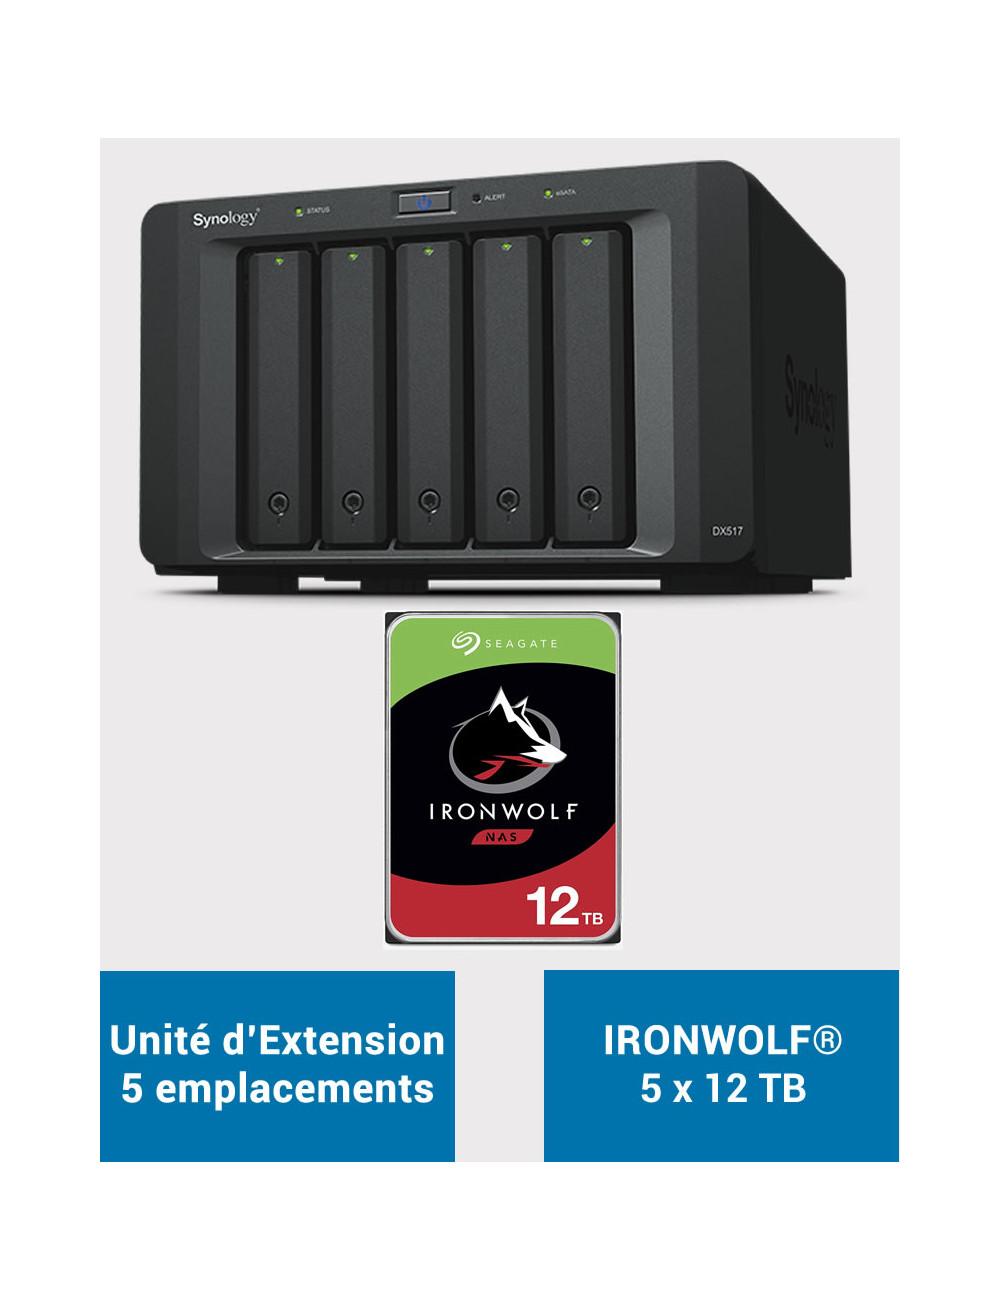 Synology RS217 NAS Server IRONWOLF 24TB (2x12TB)